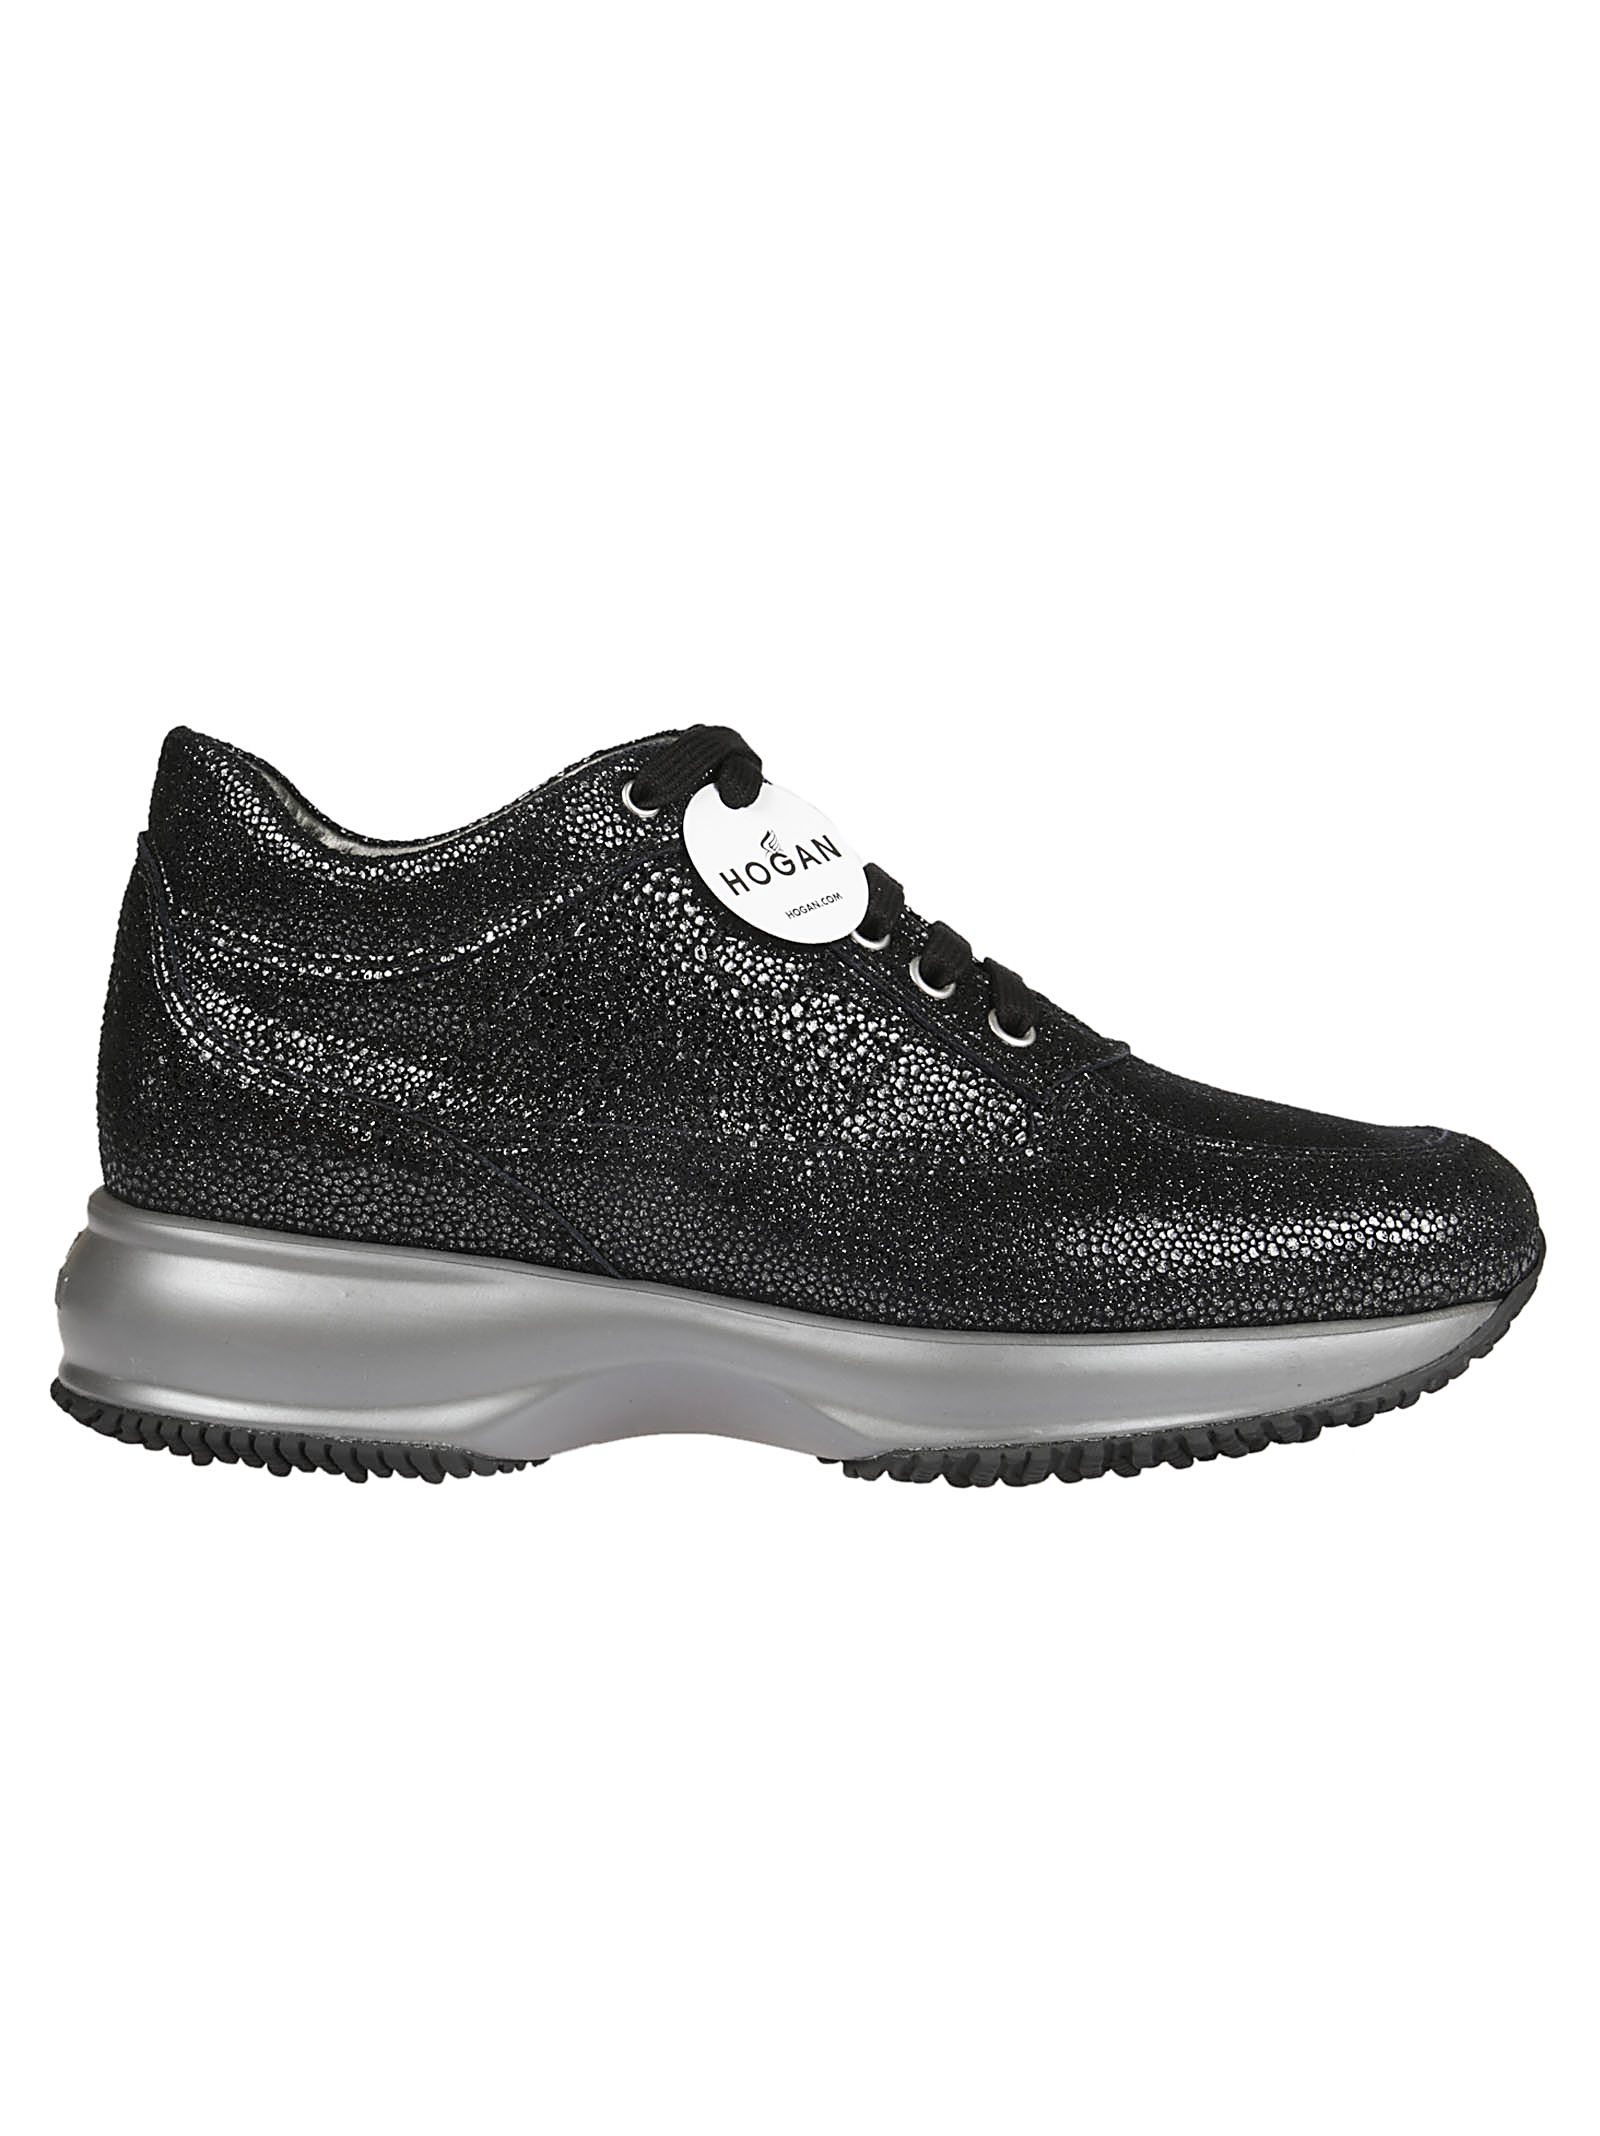 Hogan Metallic Effect Sneakers